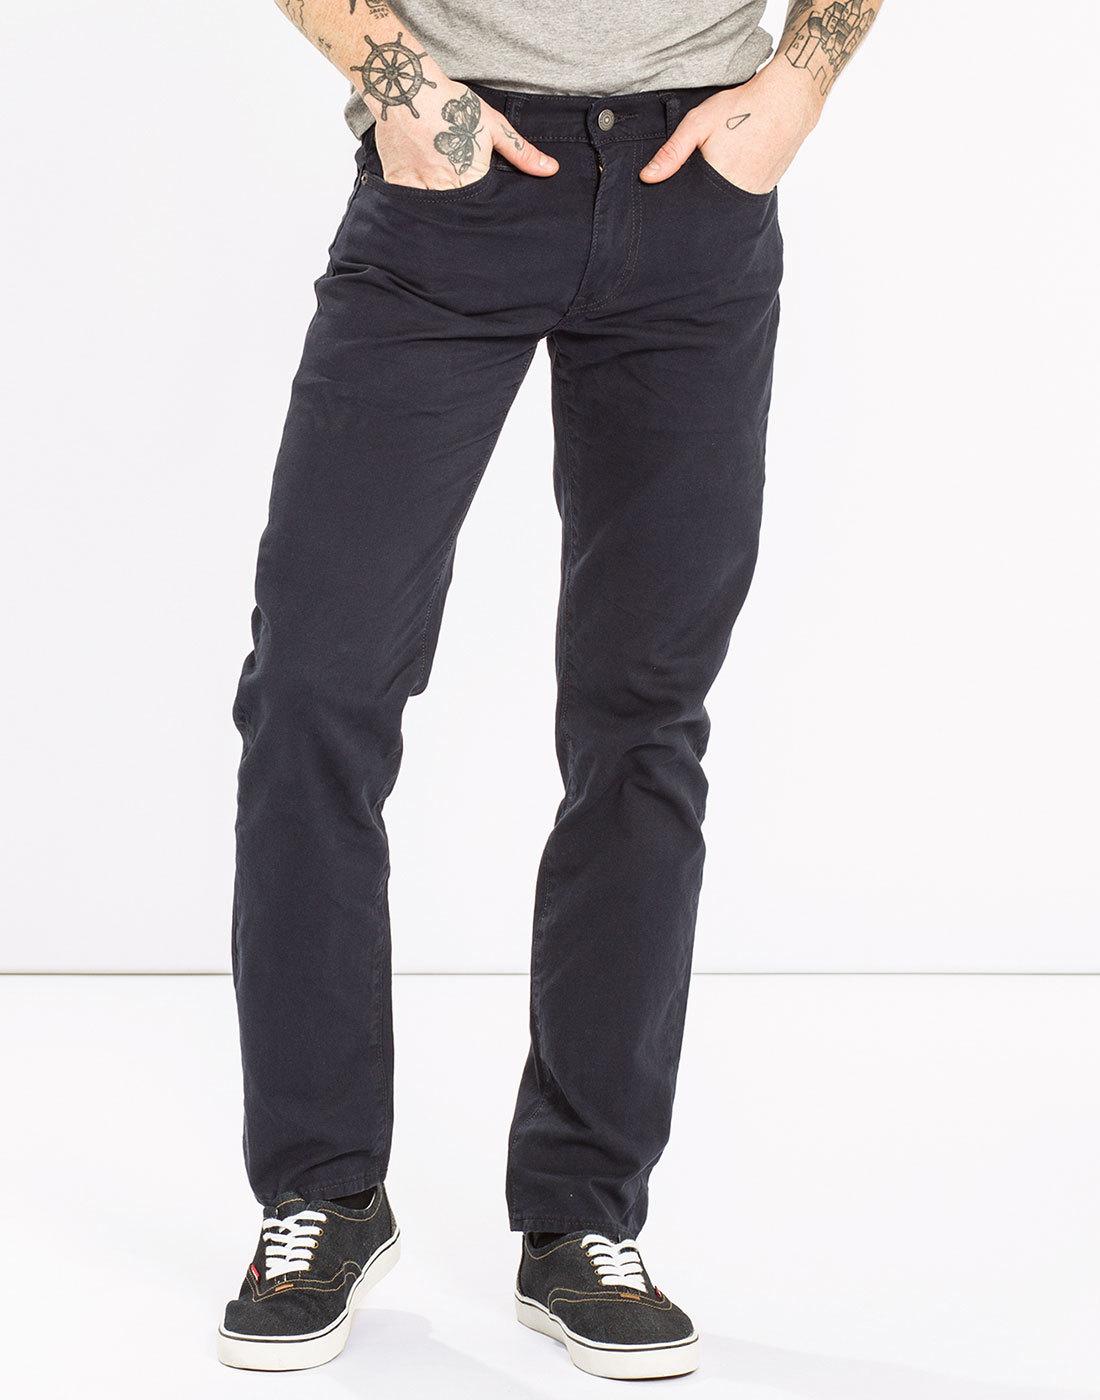 LEVI'S® 511 Retro Linen Mix Slim Jeans NIGHTWATCH